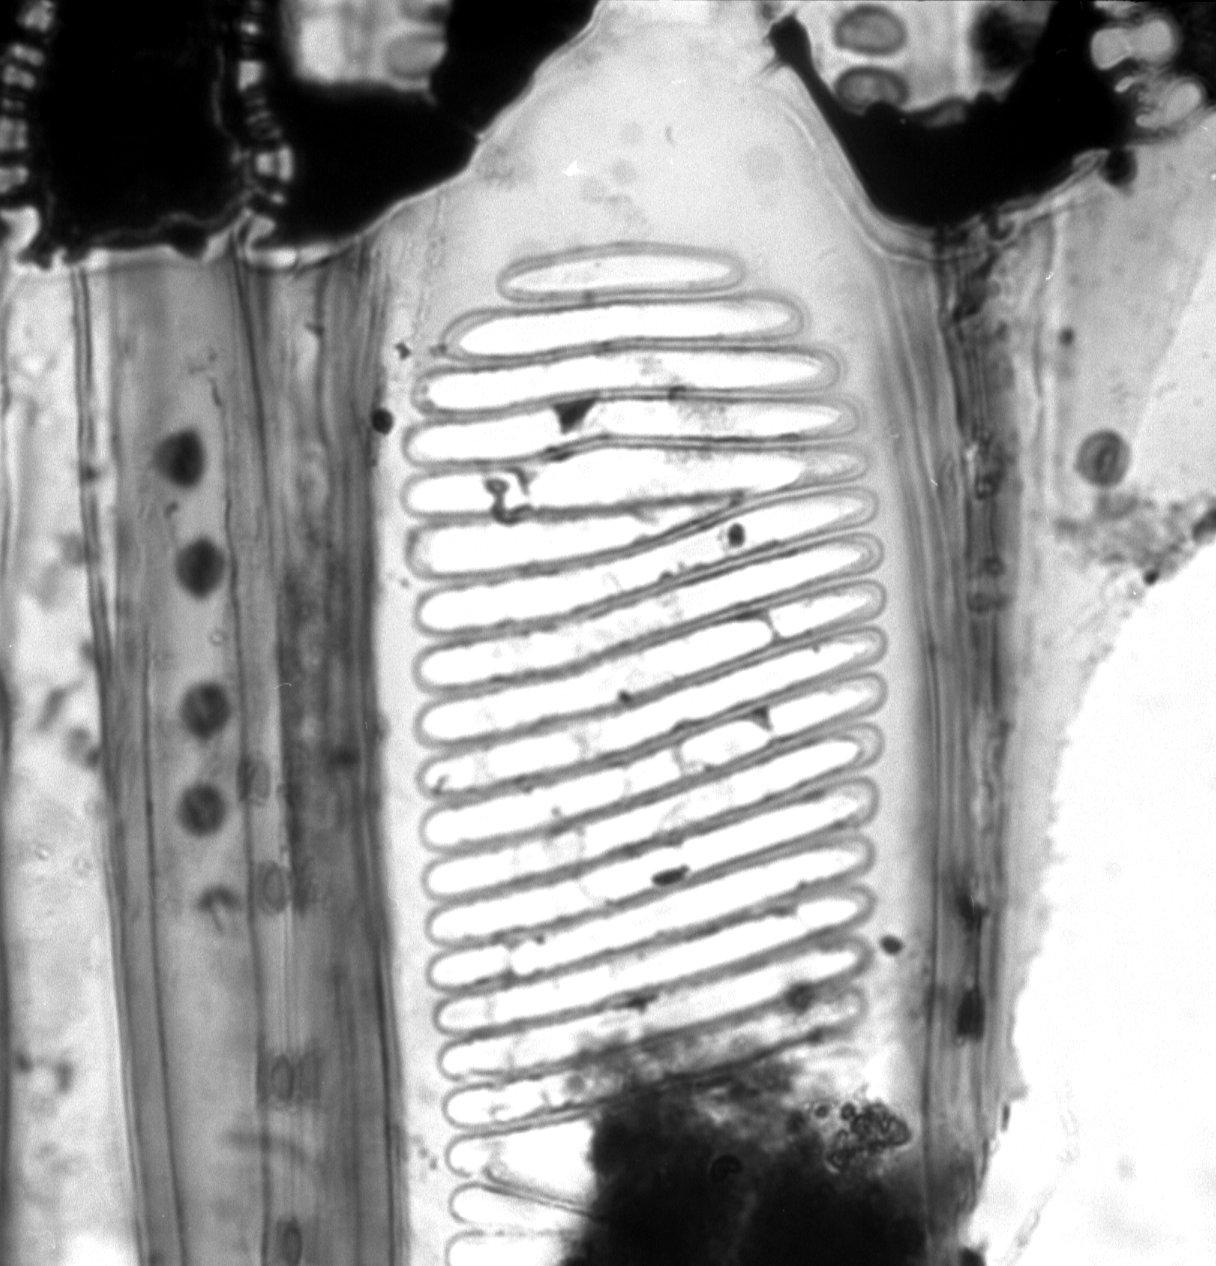 PENTAPHYLACACEAE Pentaphylax euryoides